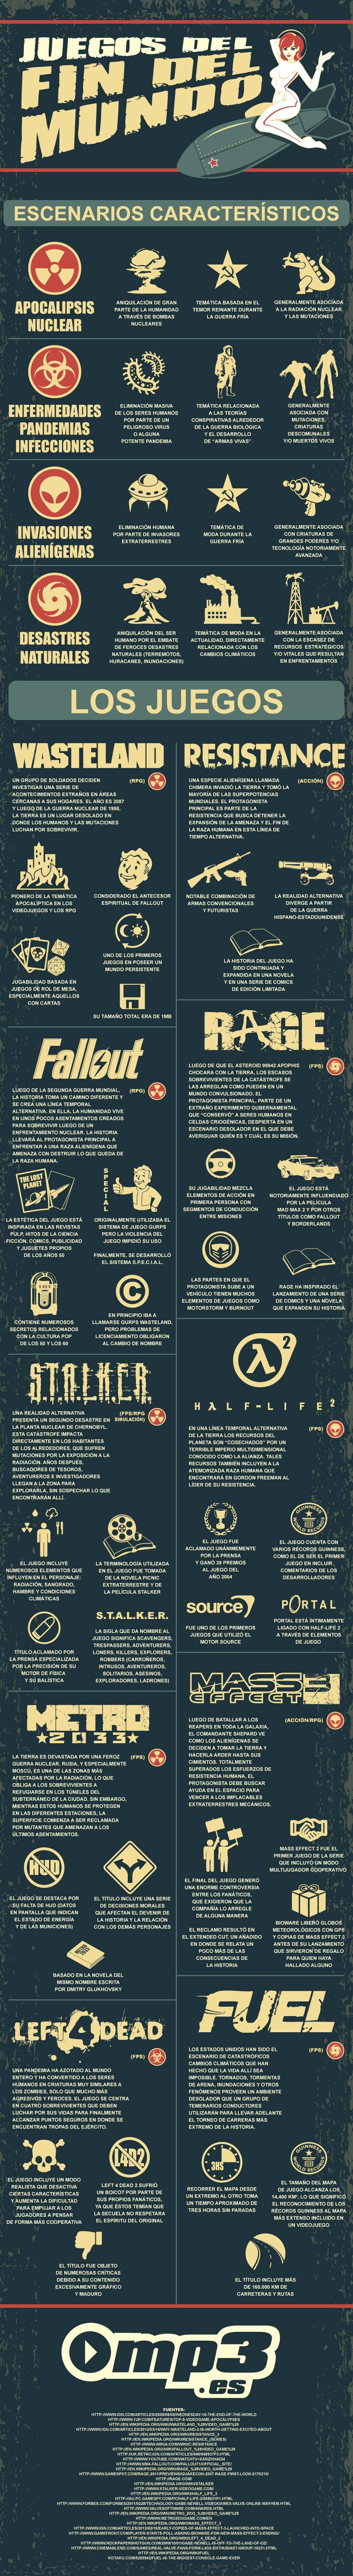 juegos-del-fin-del-mundo--infografia